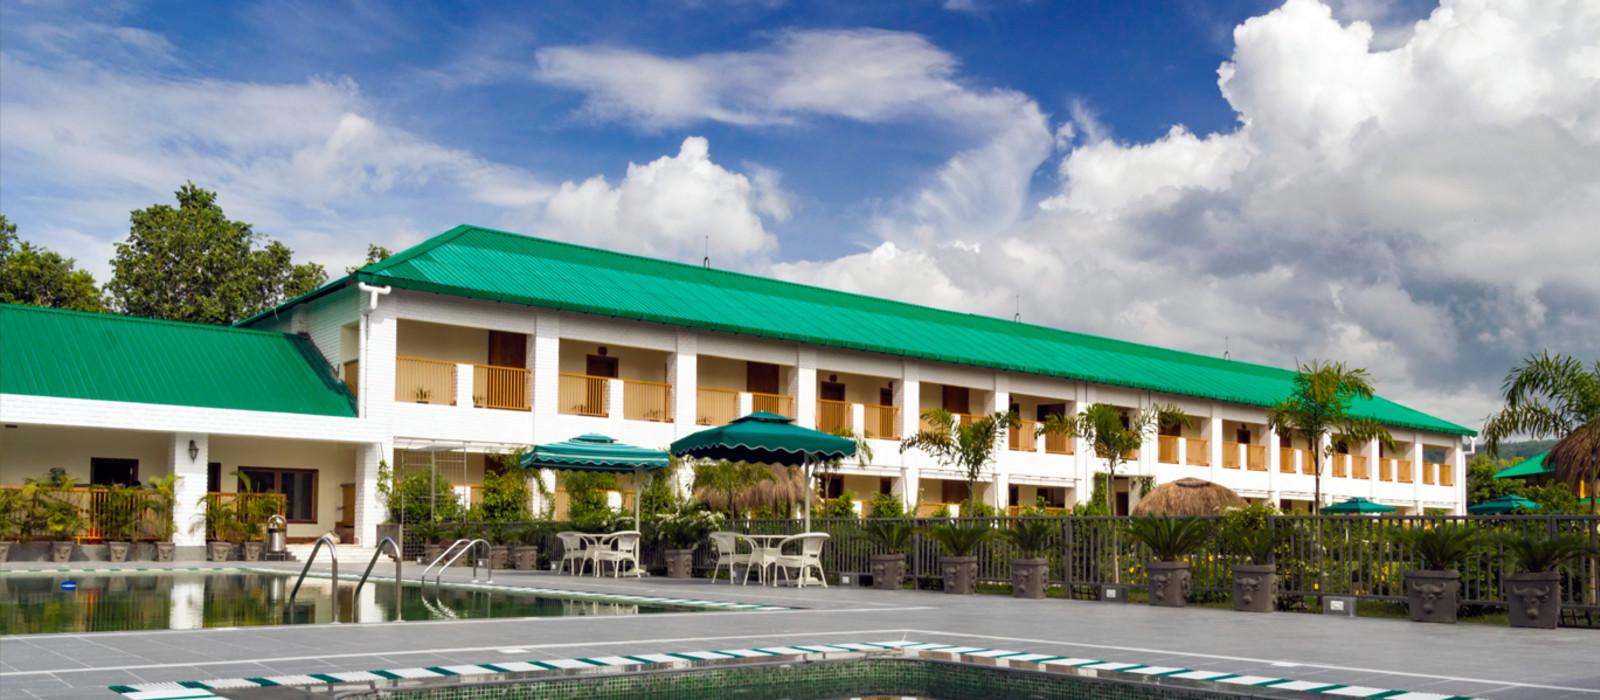 Hotel Resort Borgos & Spa East India